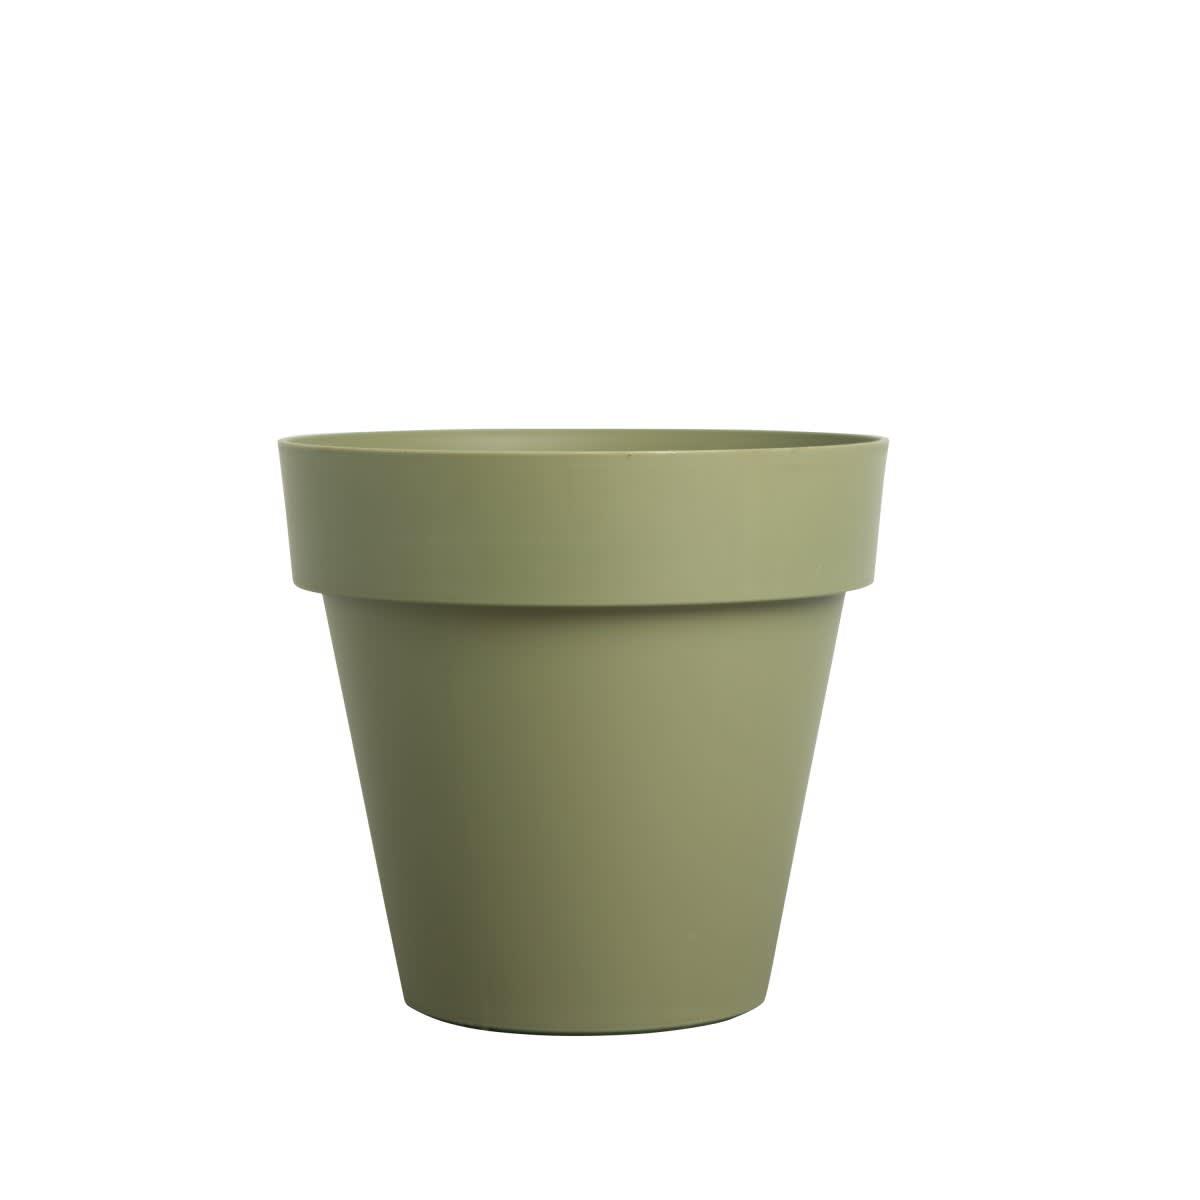 ByOn Medium Brixton Pot- 22cm diam